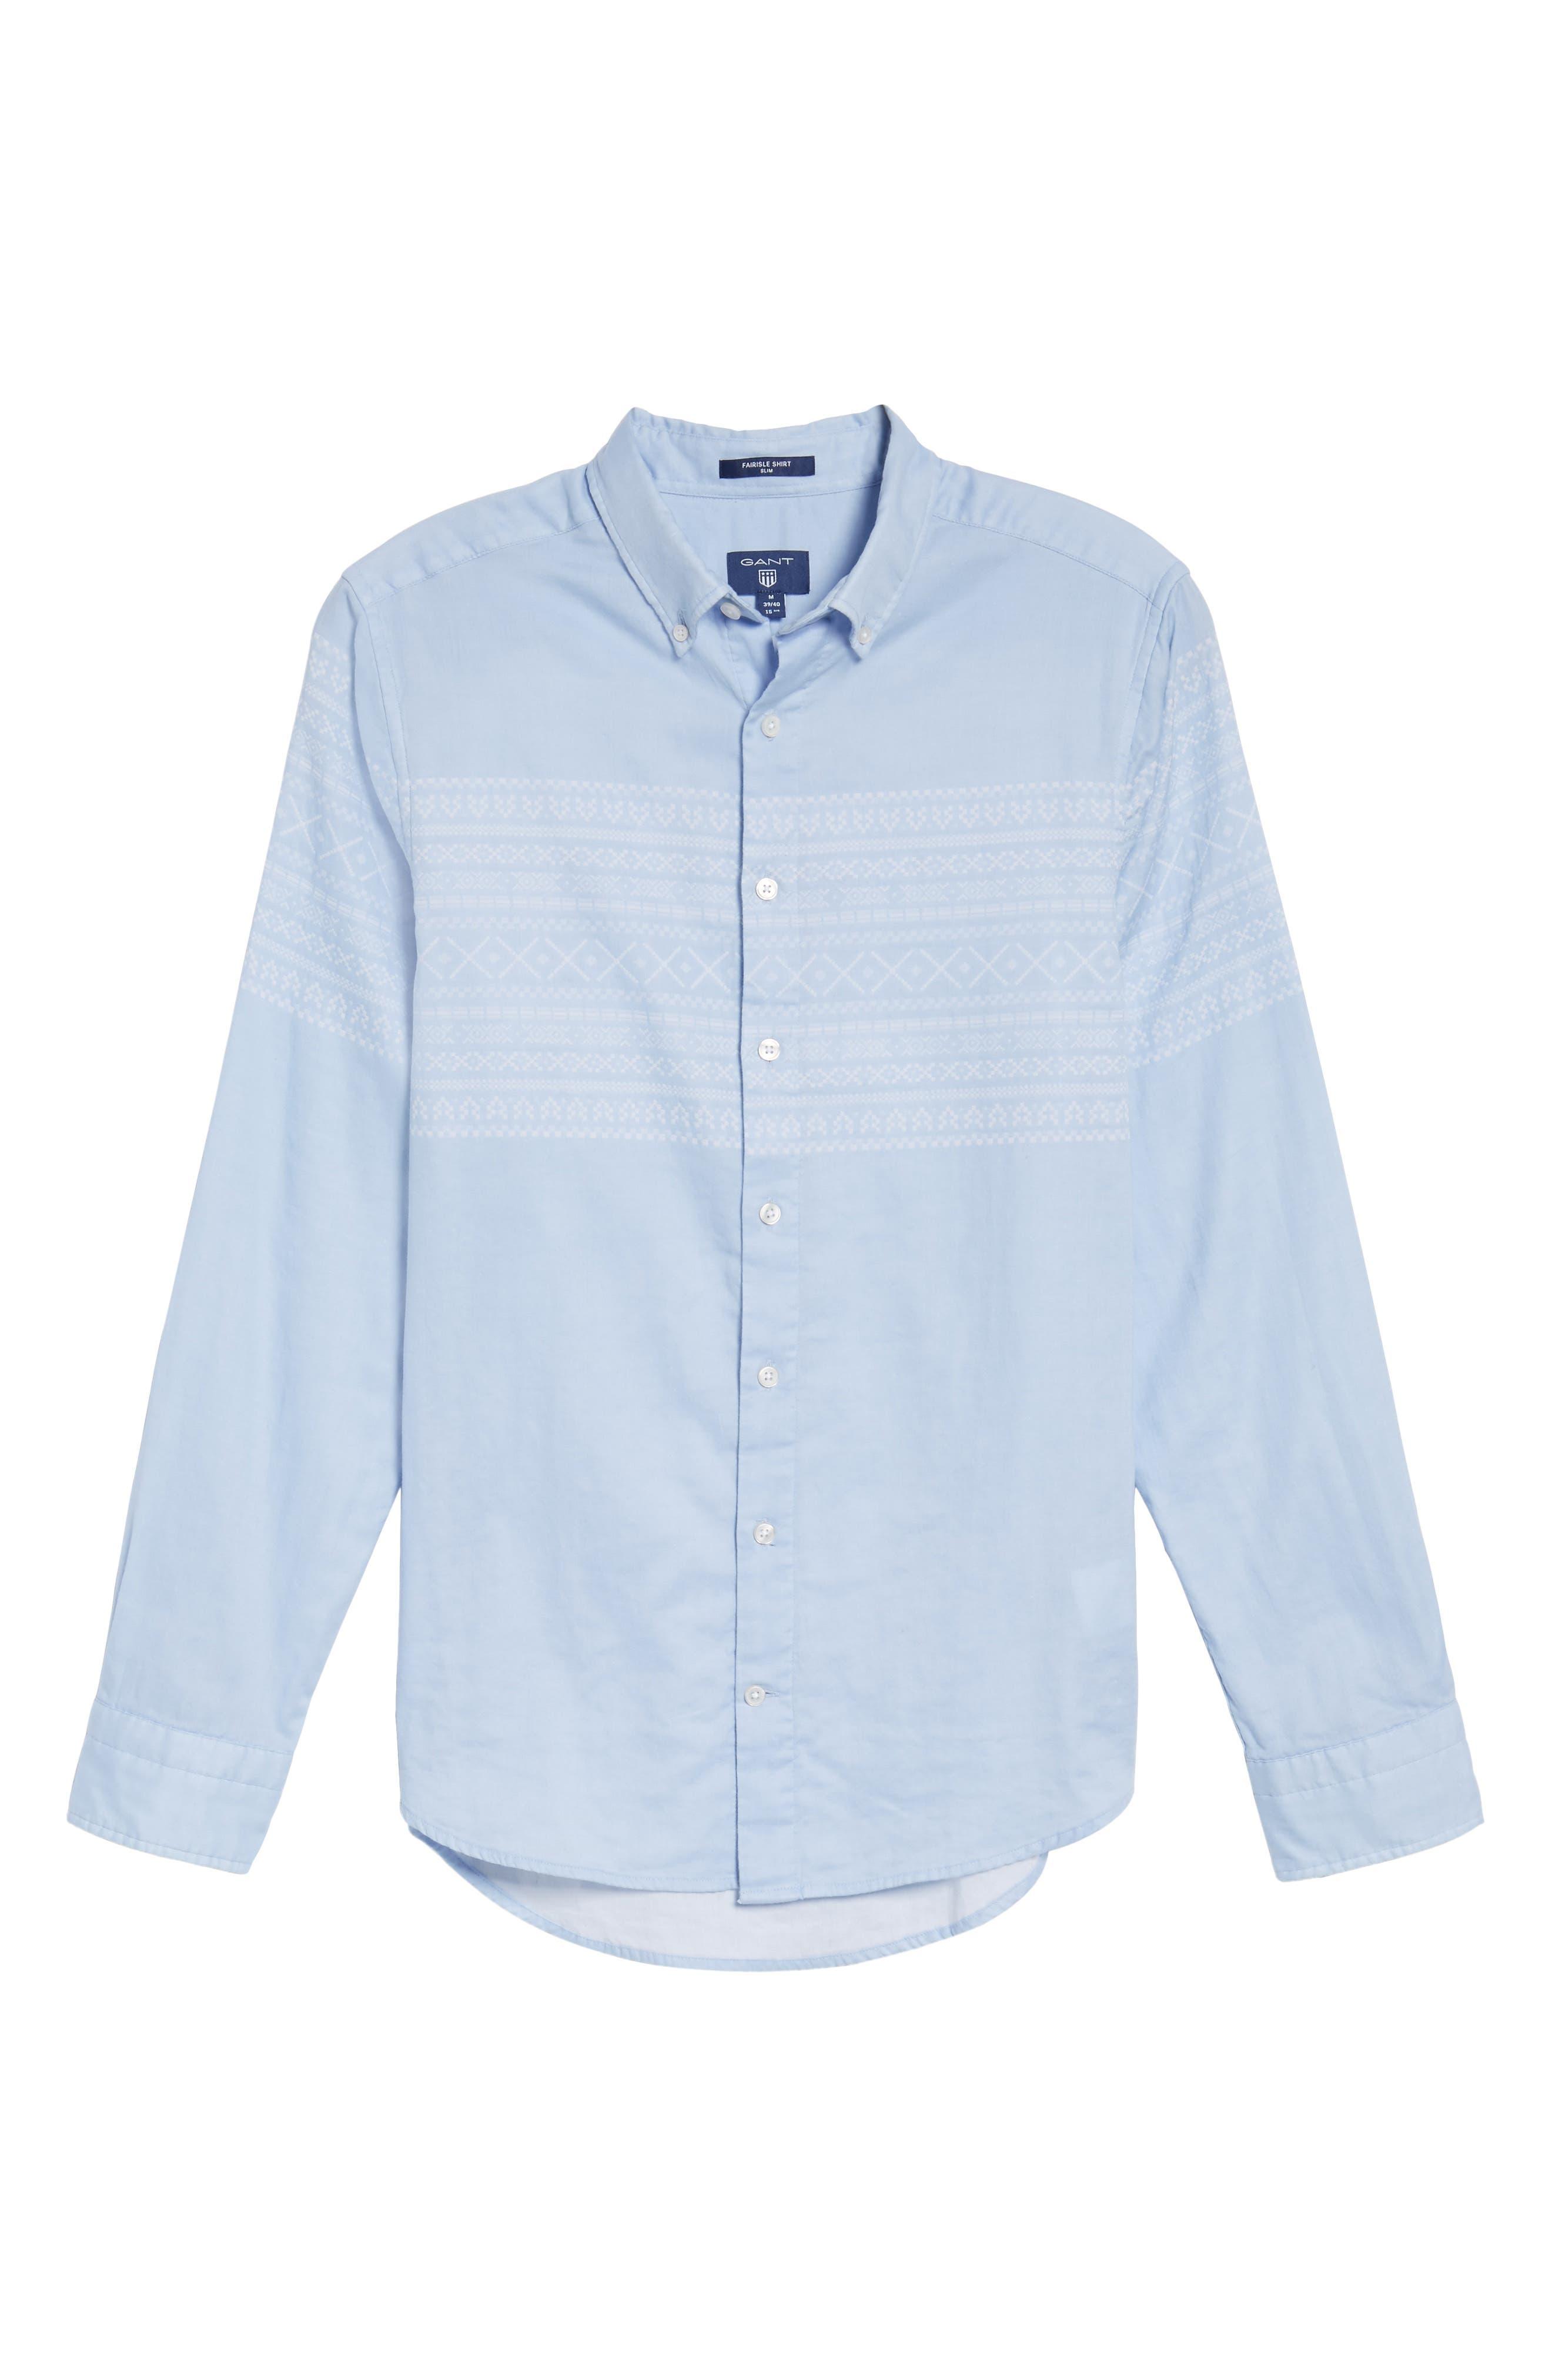 02 Extra Slim Fit Fair Isle Print Sport Shirt,                             Alternate thumbnail 6, color,                             Hamptons Blue